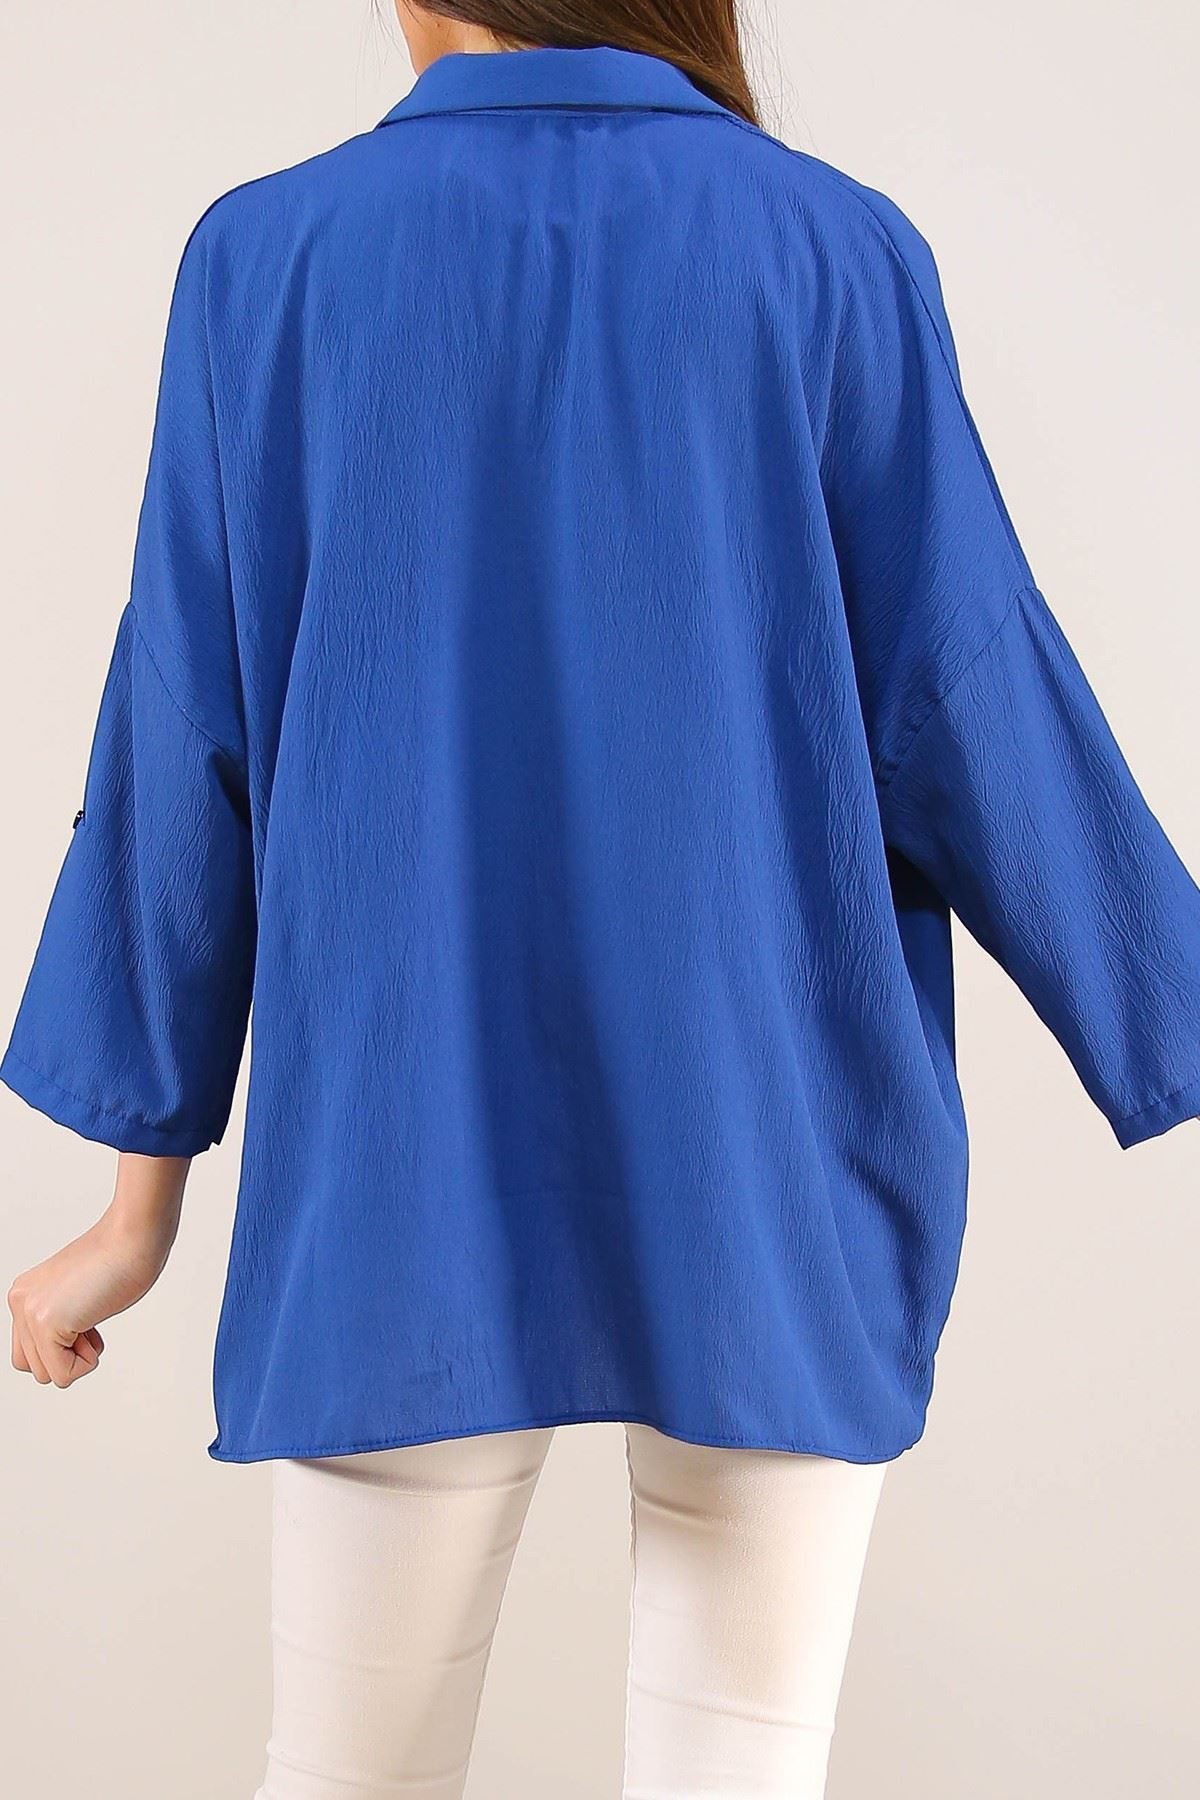 Salaş Gömlek Mavi - 4806.701.